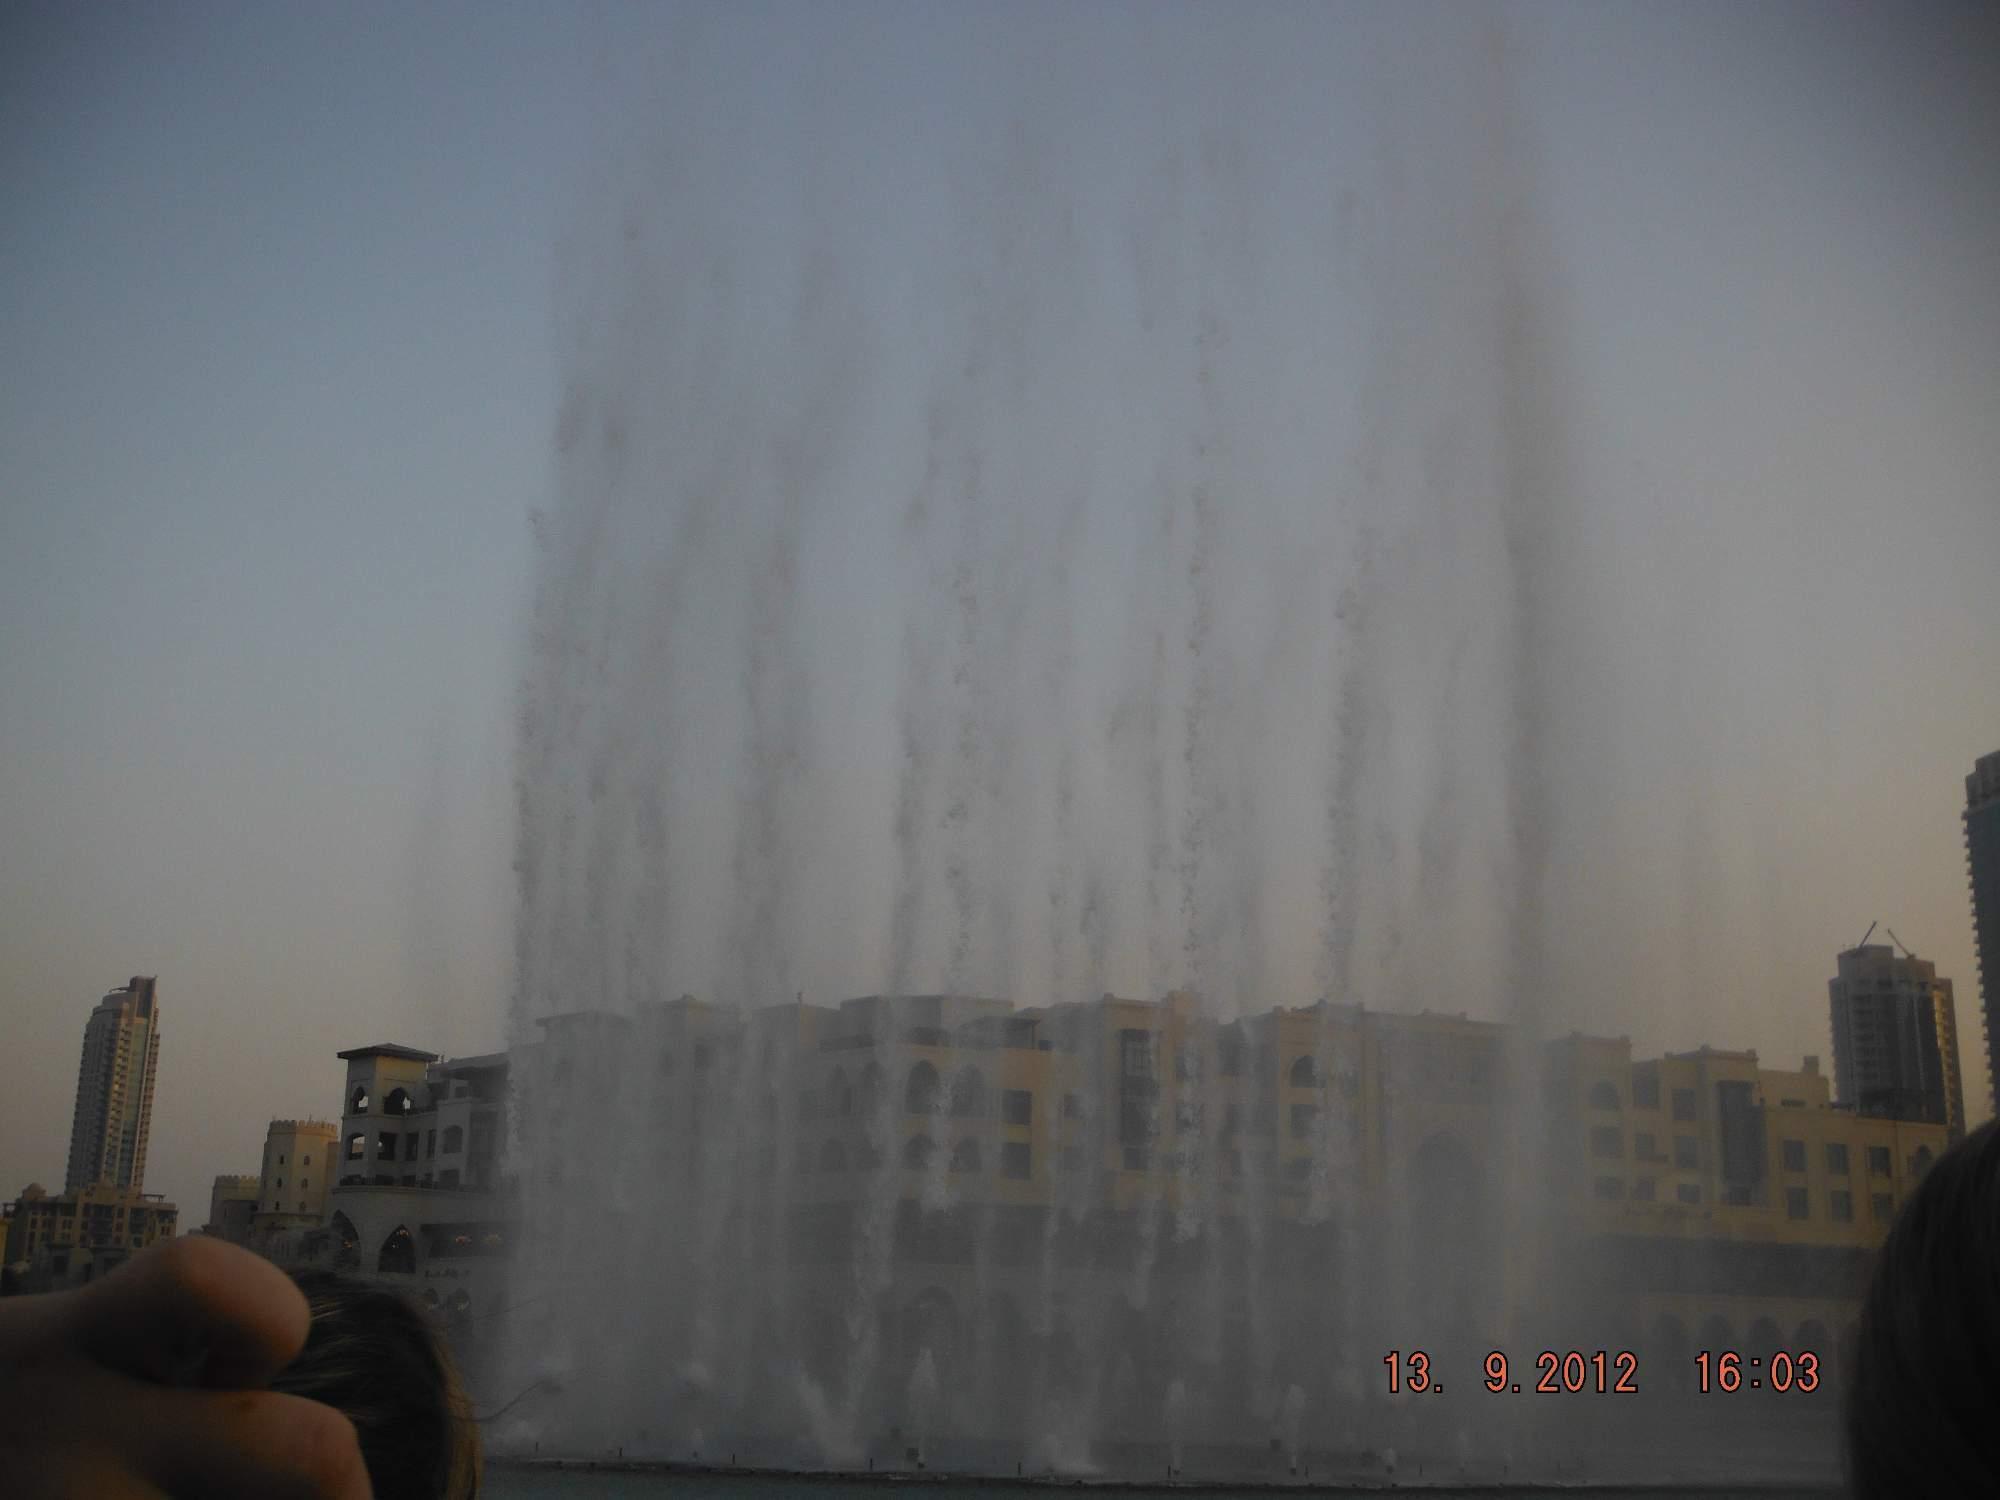 http://img24.rajce.idnes.cz/d2403/13/13214/13214242_a1e43f49e51a1daa7632f800d4edae3f/images/SAE146.jpg